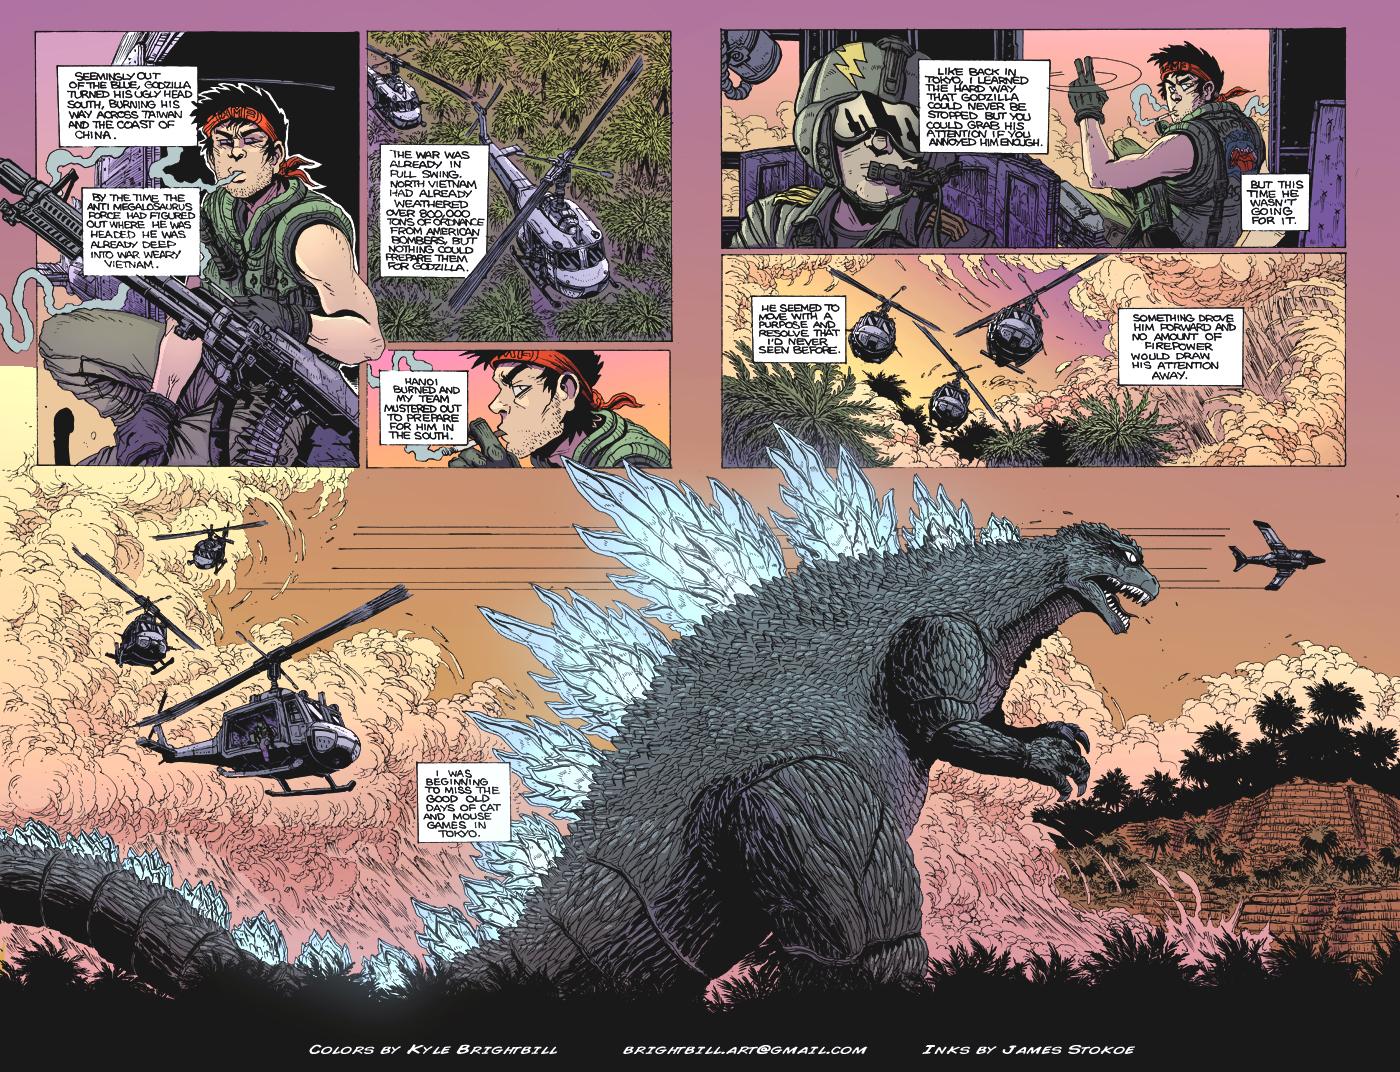 Godzilla  James Stokoe NYCC Print.jpg